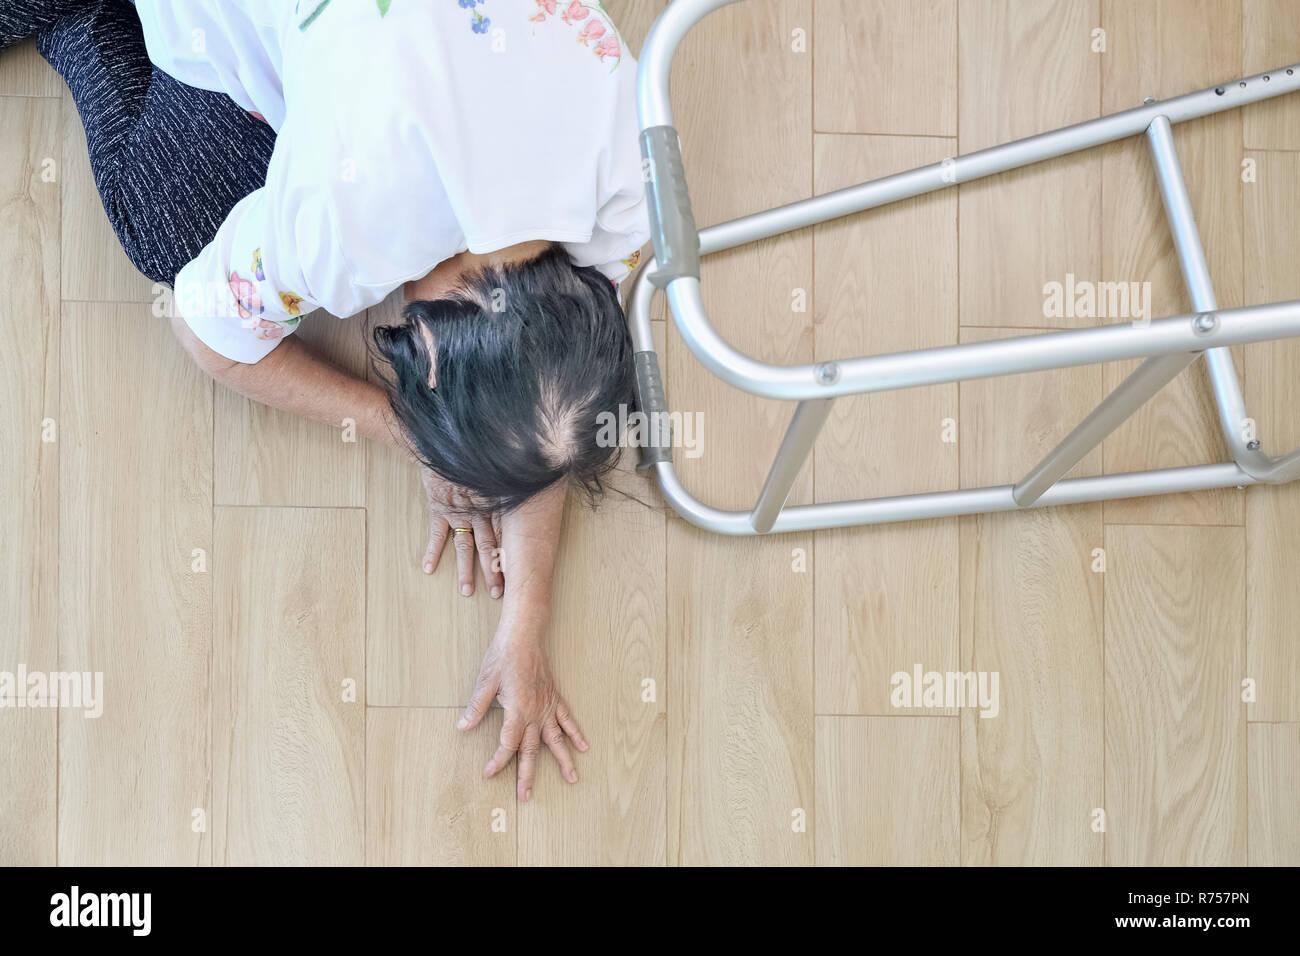 Donna anziana caduta in casa ,gli infarti. Foto Stock